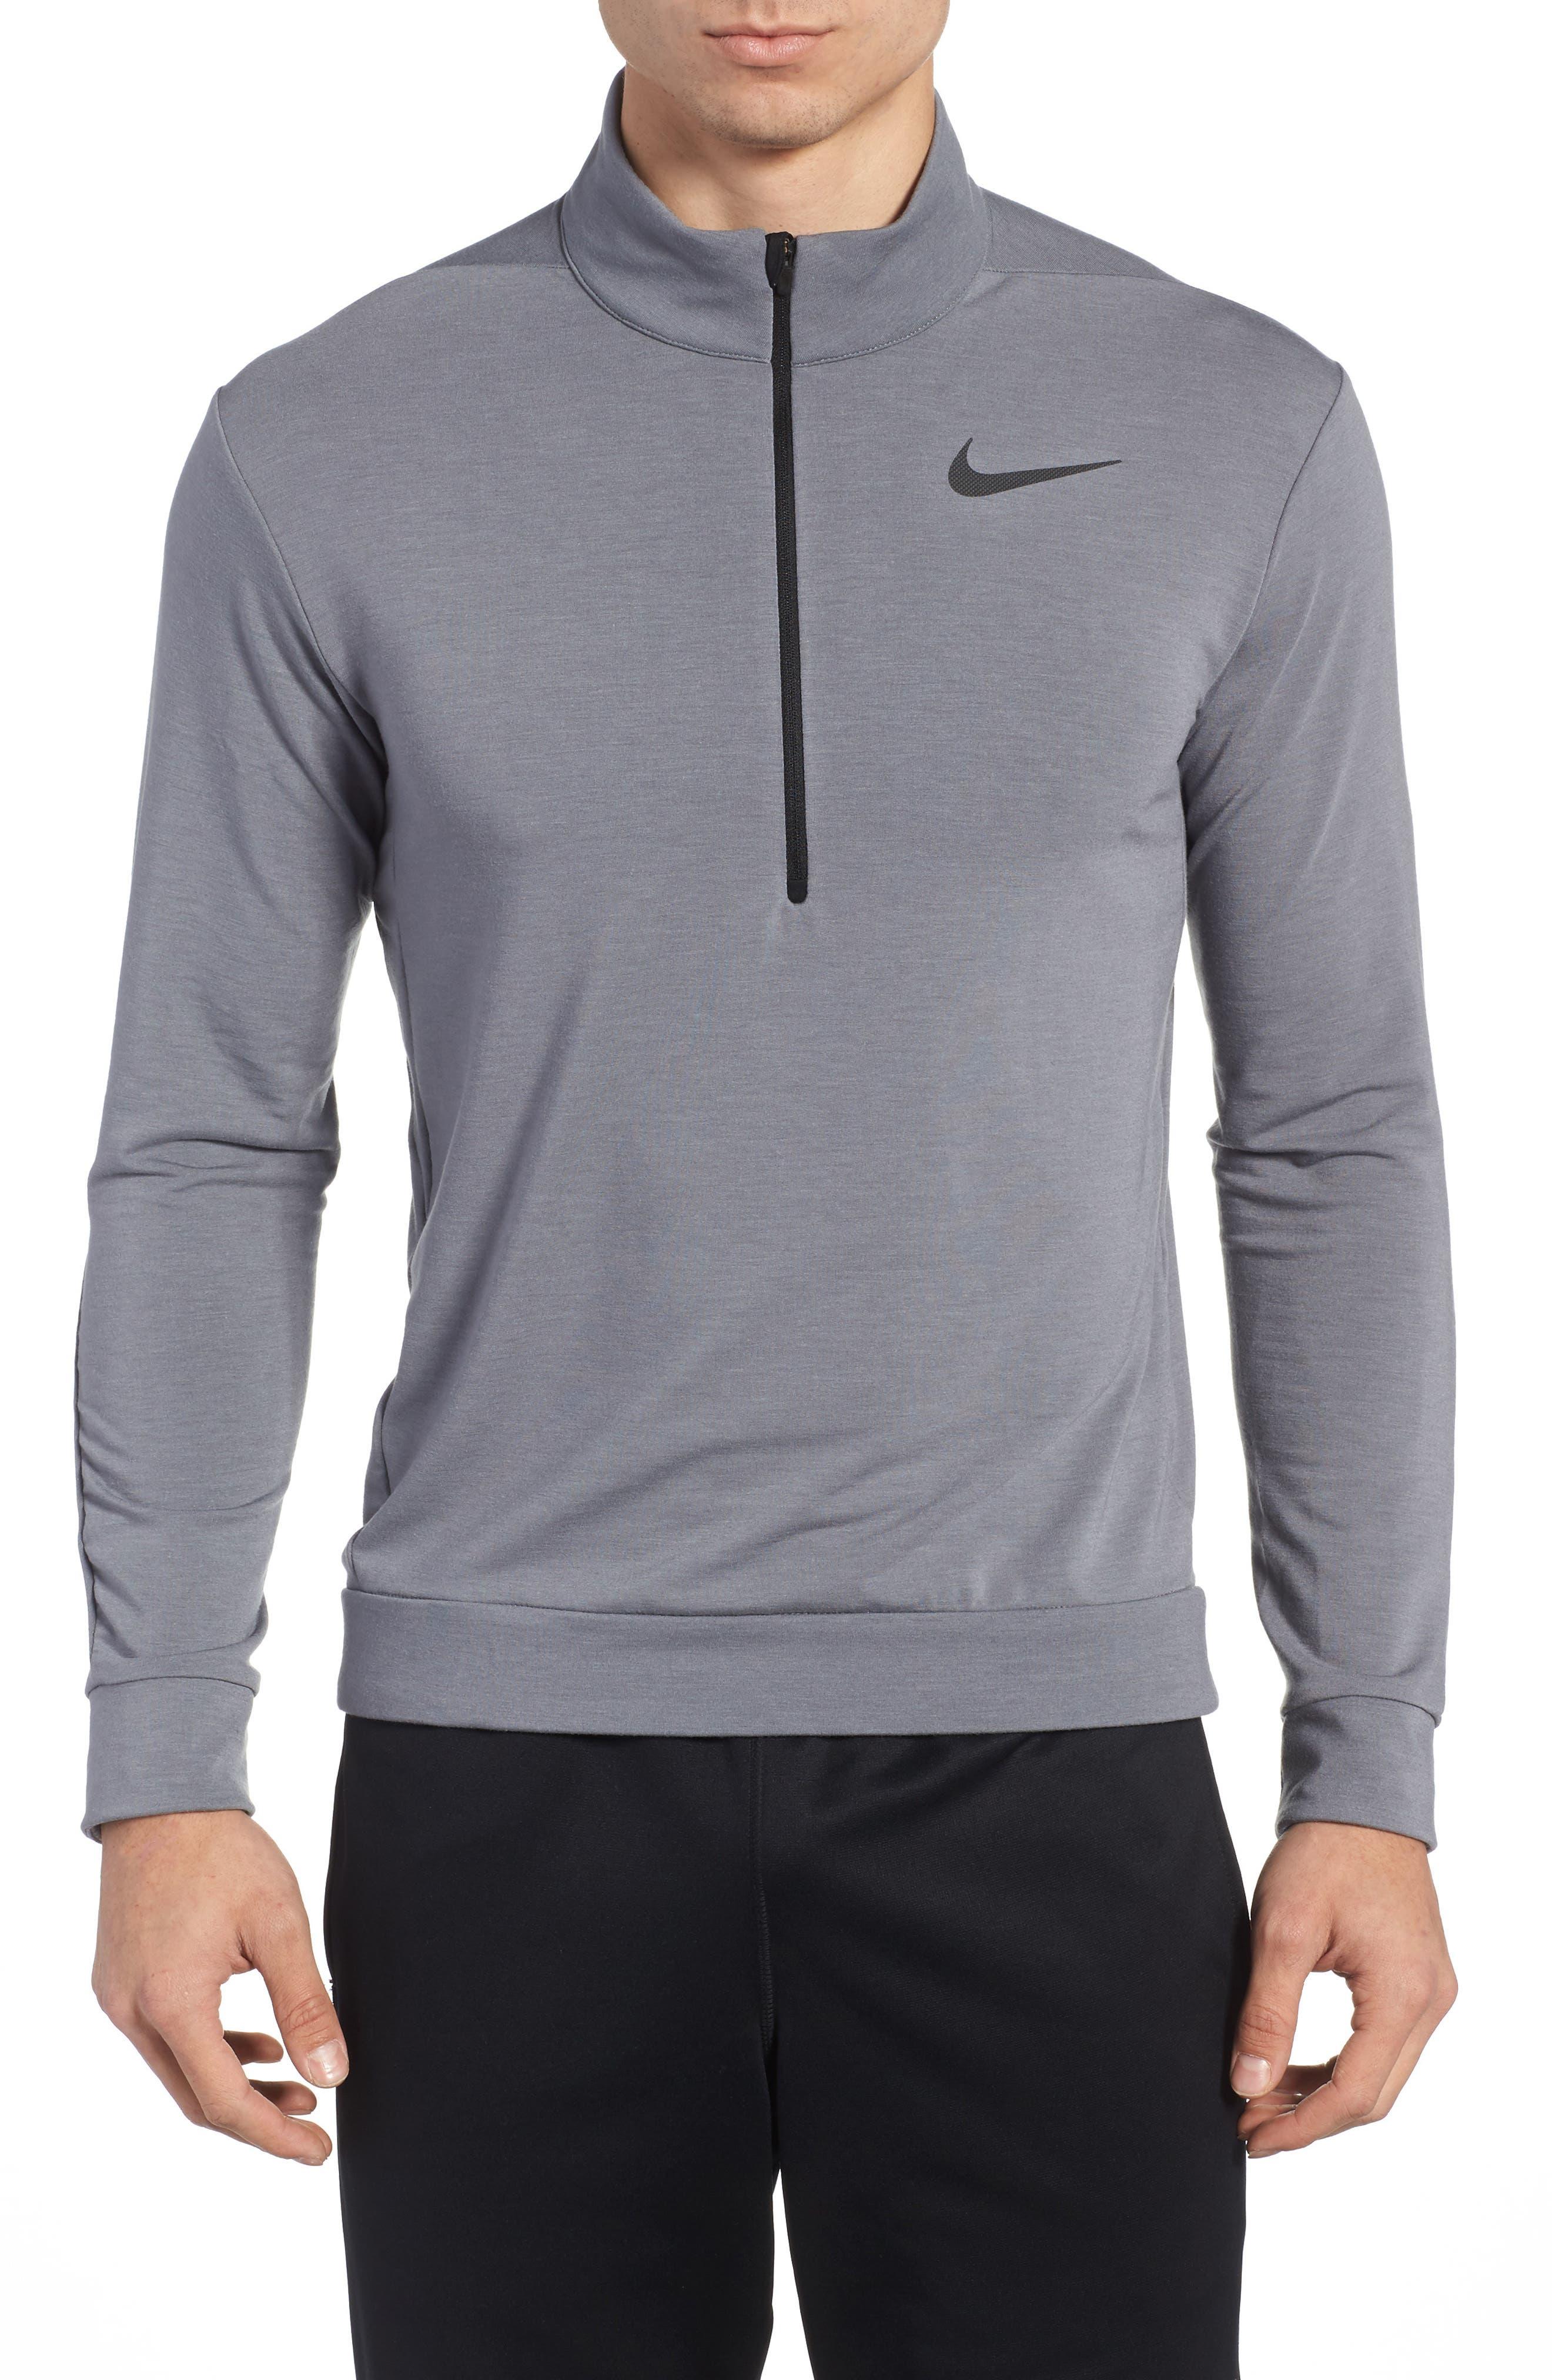 nike 1 4 zip pullover. nike dry training quarter zip pullover 1 4